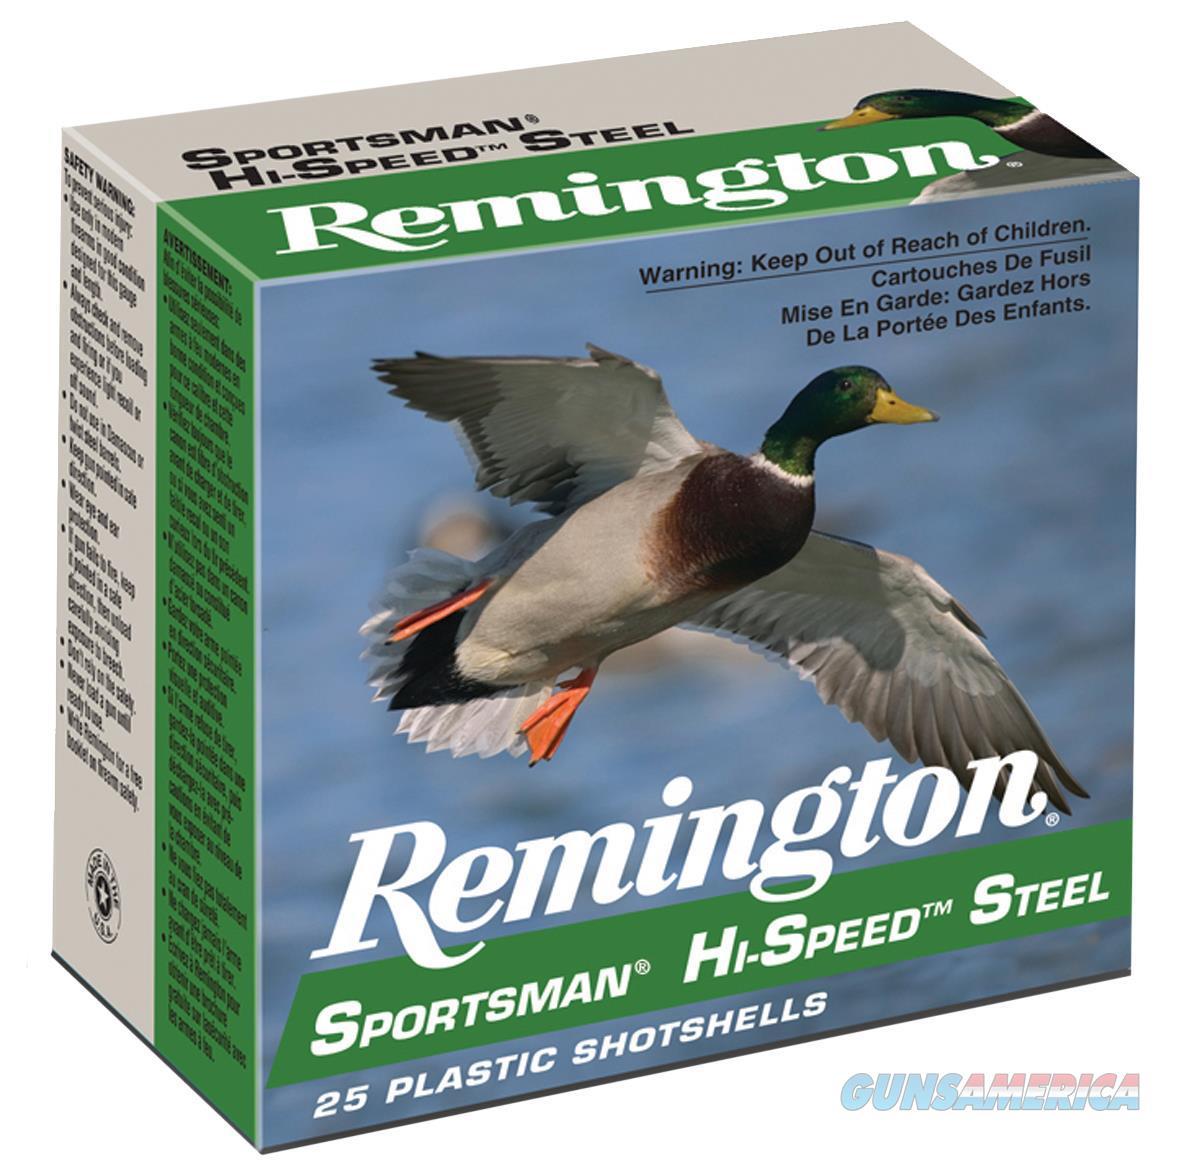 "Rem Sst12hm2 Sportsman Steel Loads 12 Ga 3"" 1.4 Oz 2 Shot 25Box/10Case SST12HM2  Non-Guns > Ammunition"